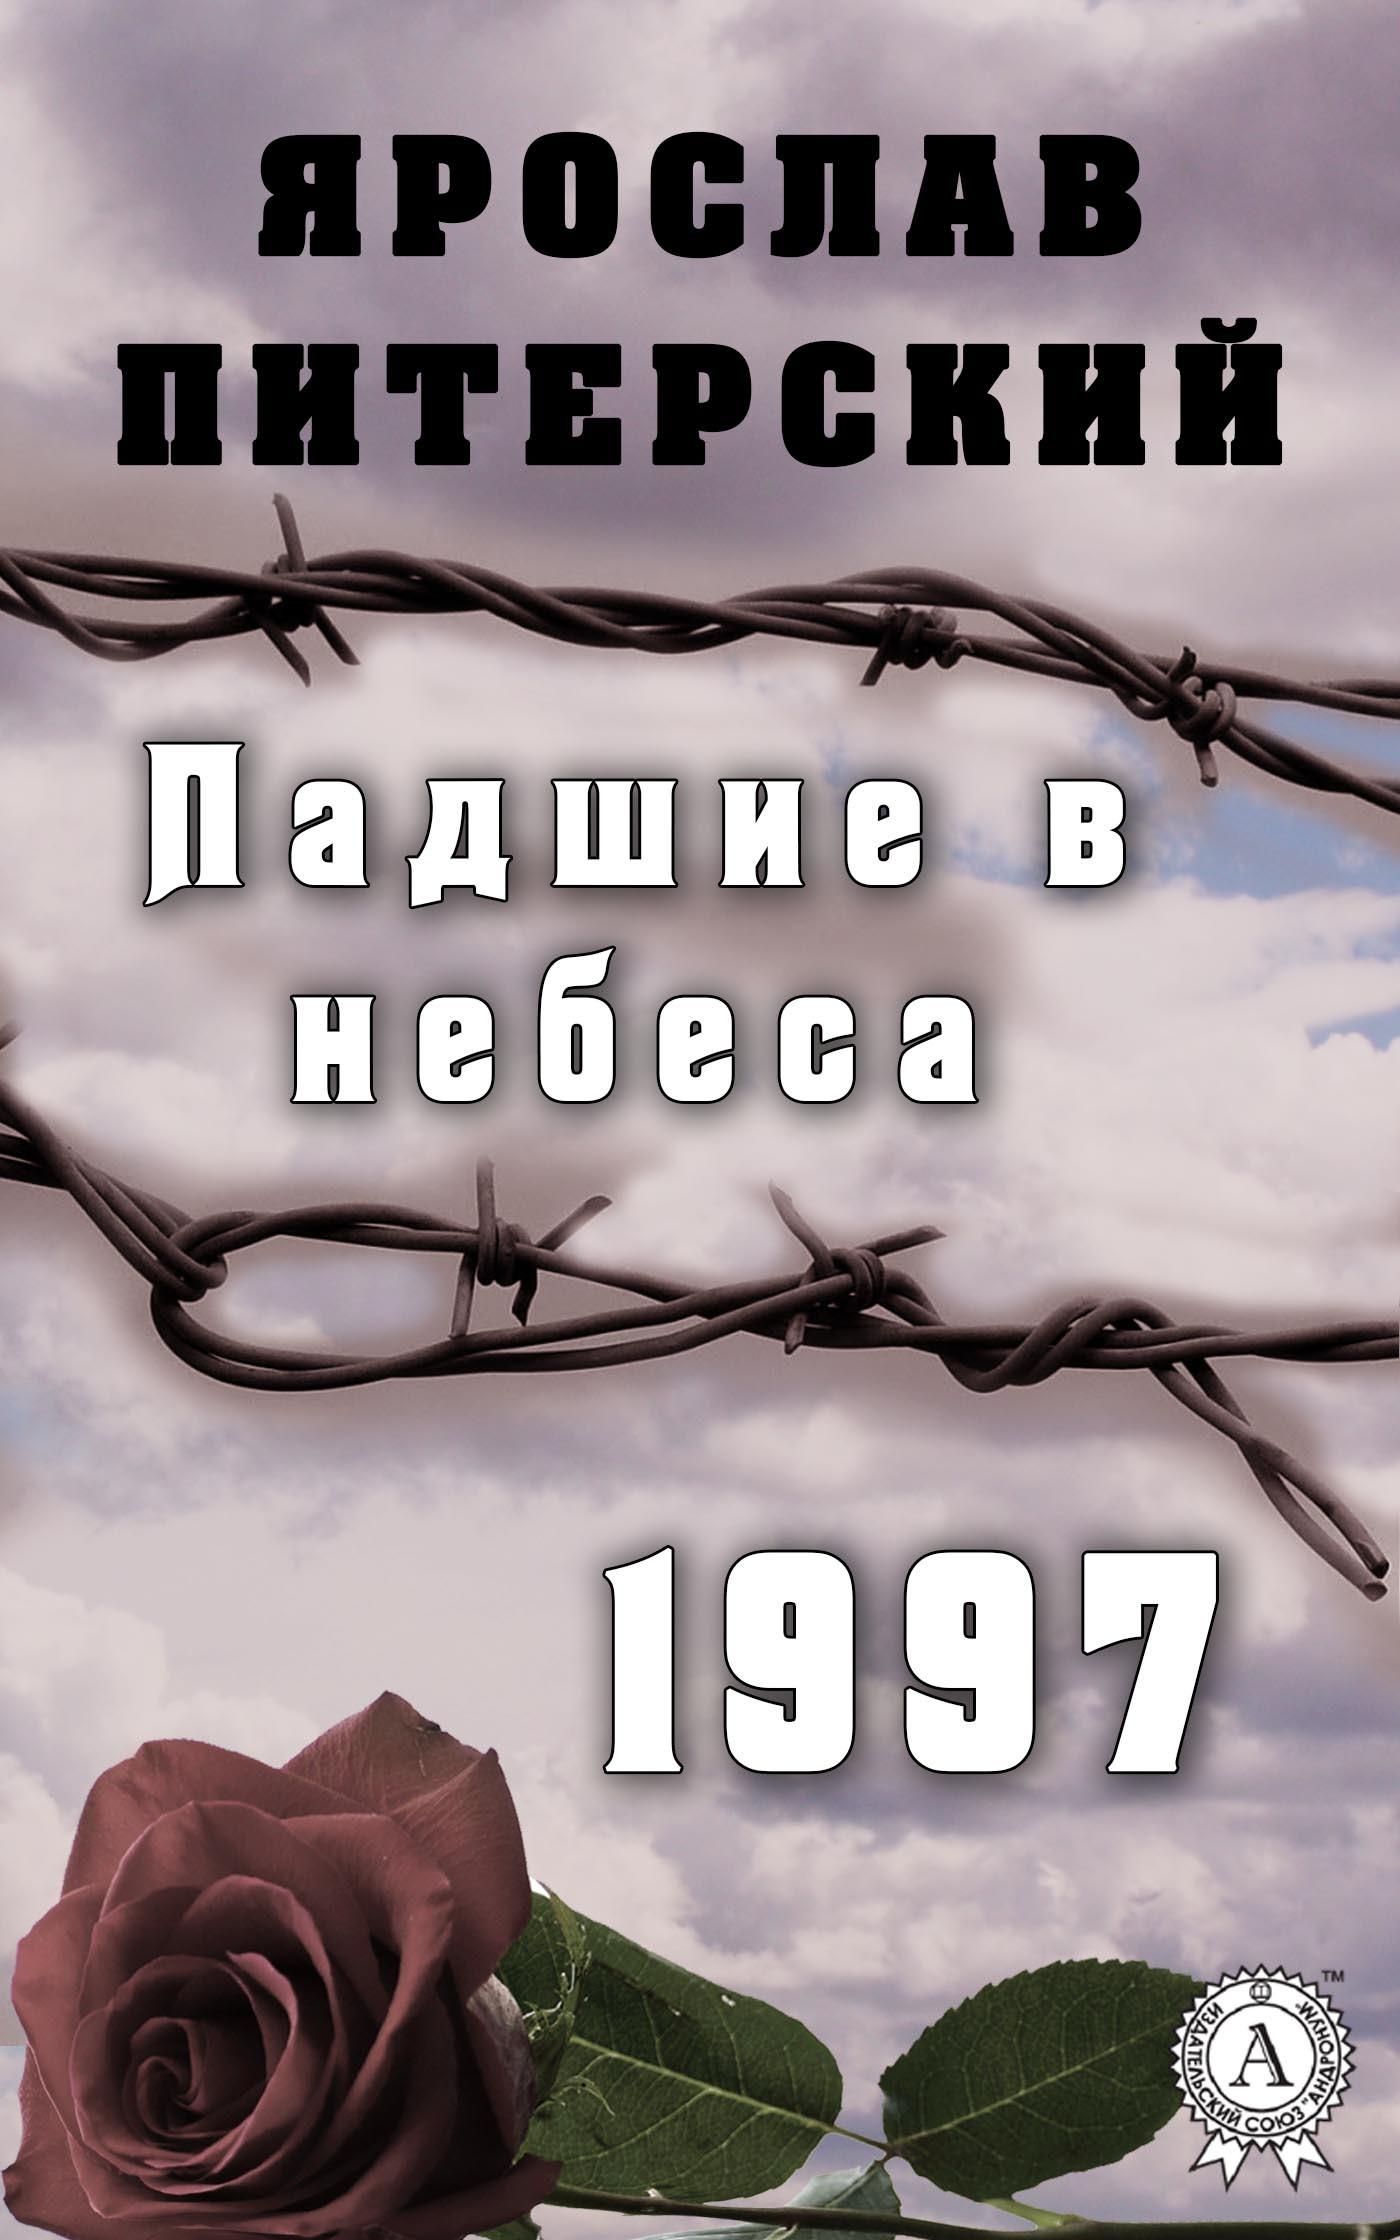 Ярослав Питерский Падшие в небеса. 1997 мишка тед из фильма третий лишний